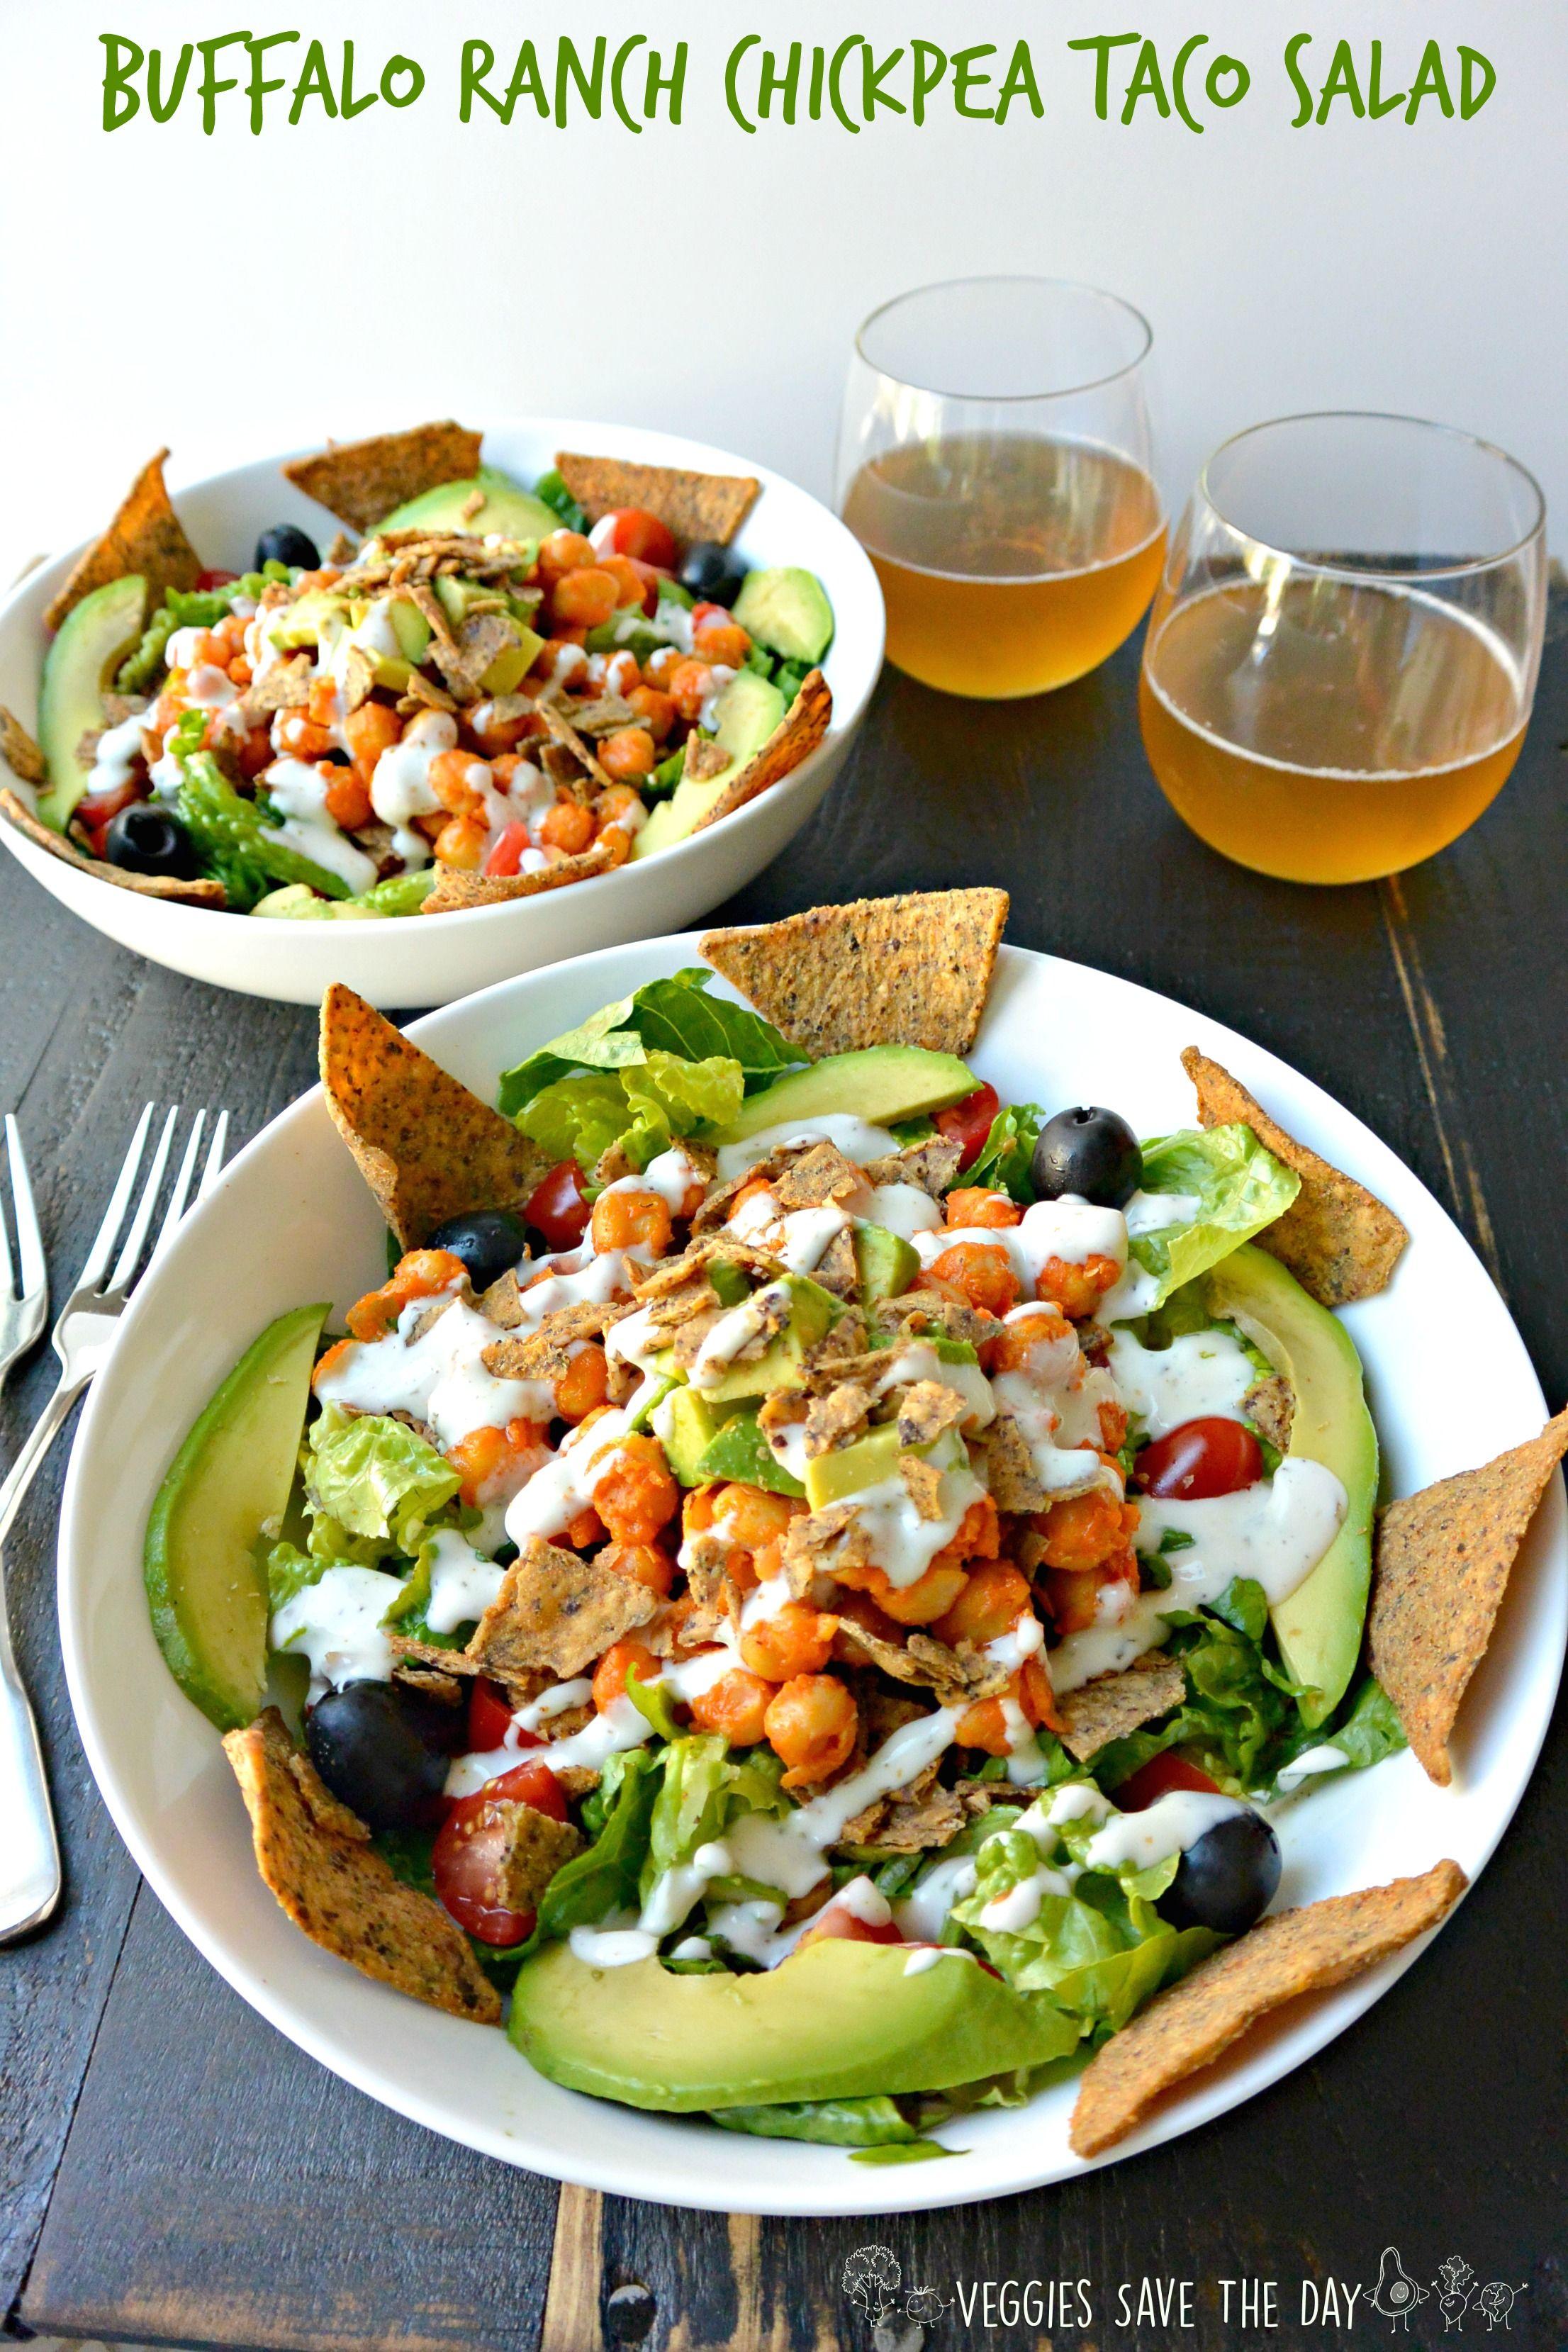 Buffalo Ranch Chickpea Taco Salad (vegan, gluten-free)